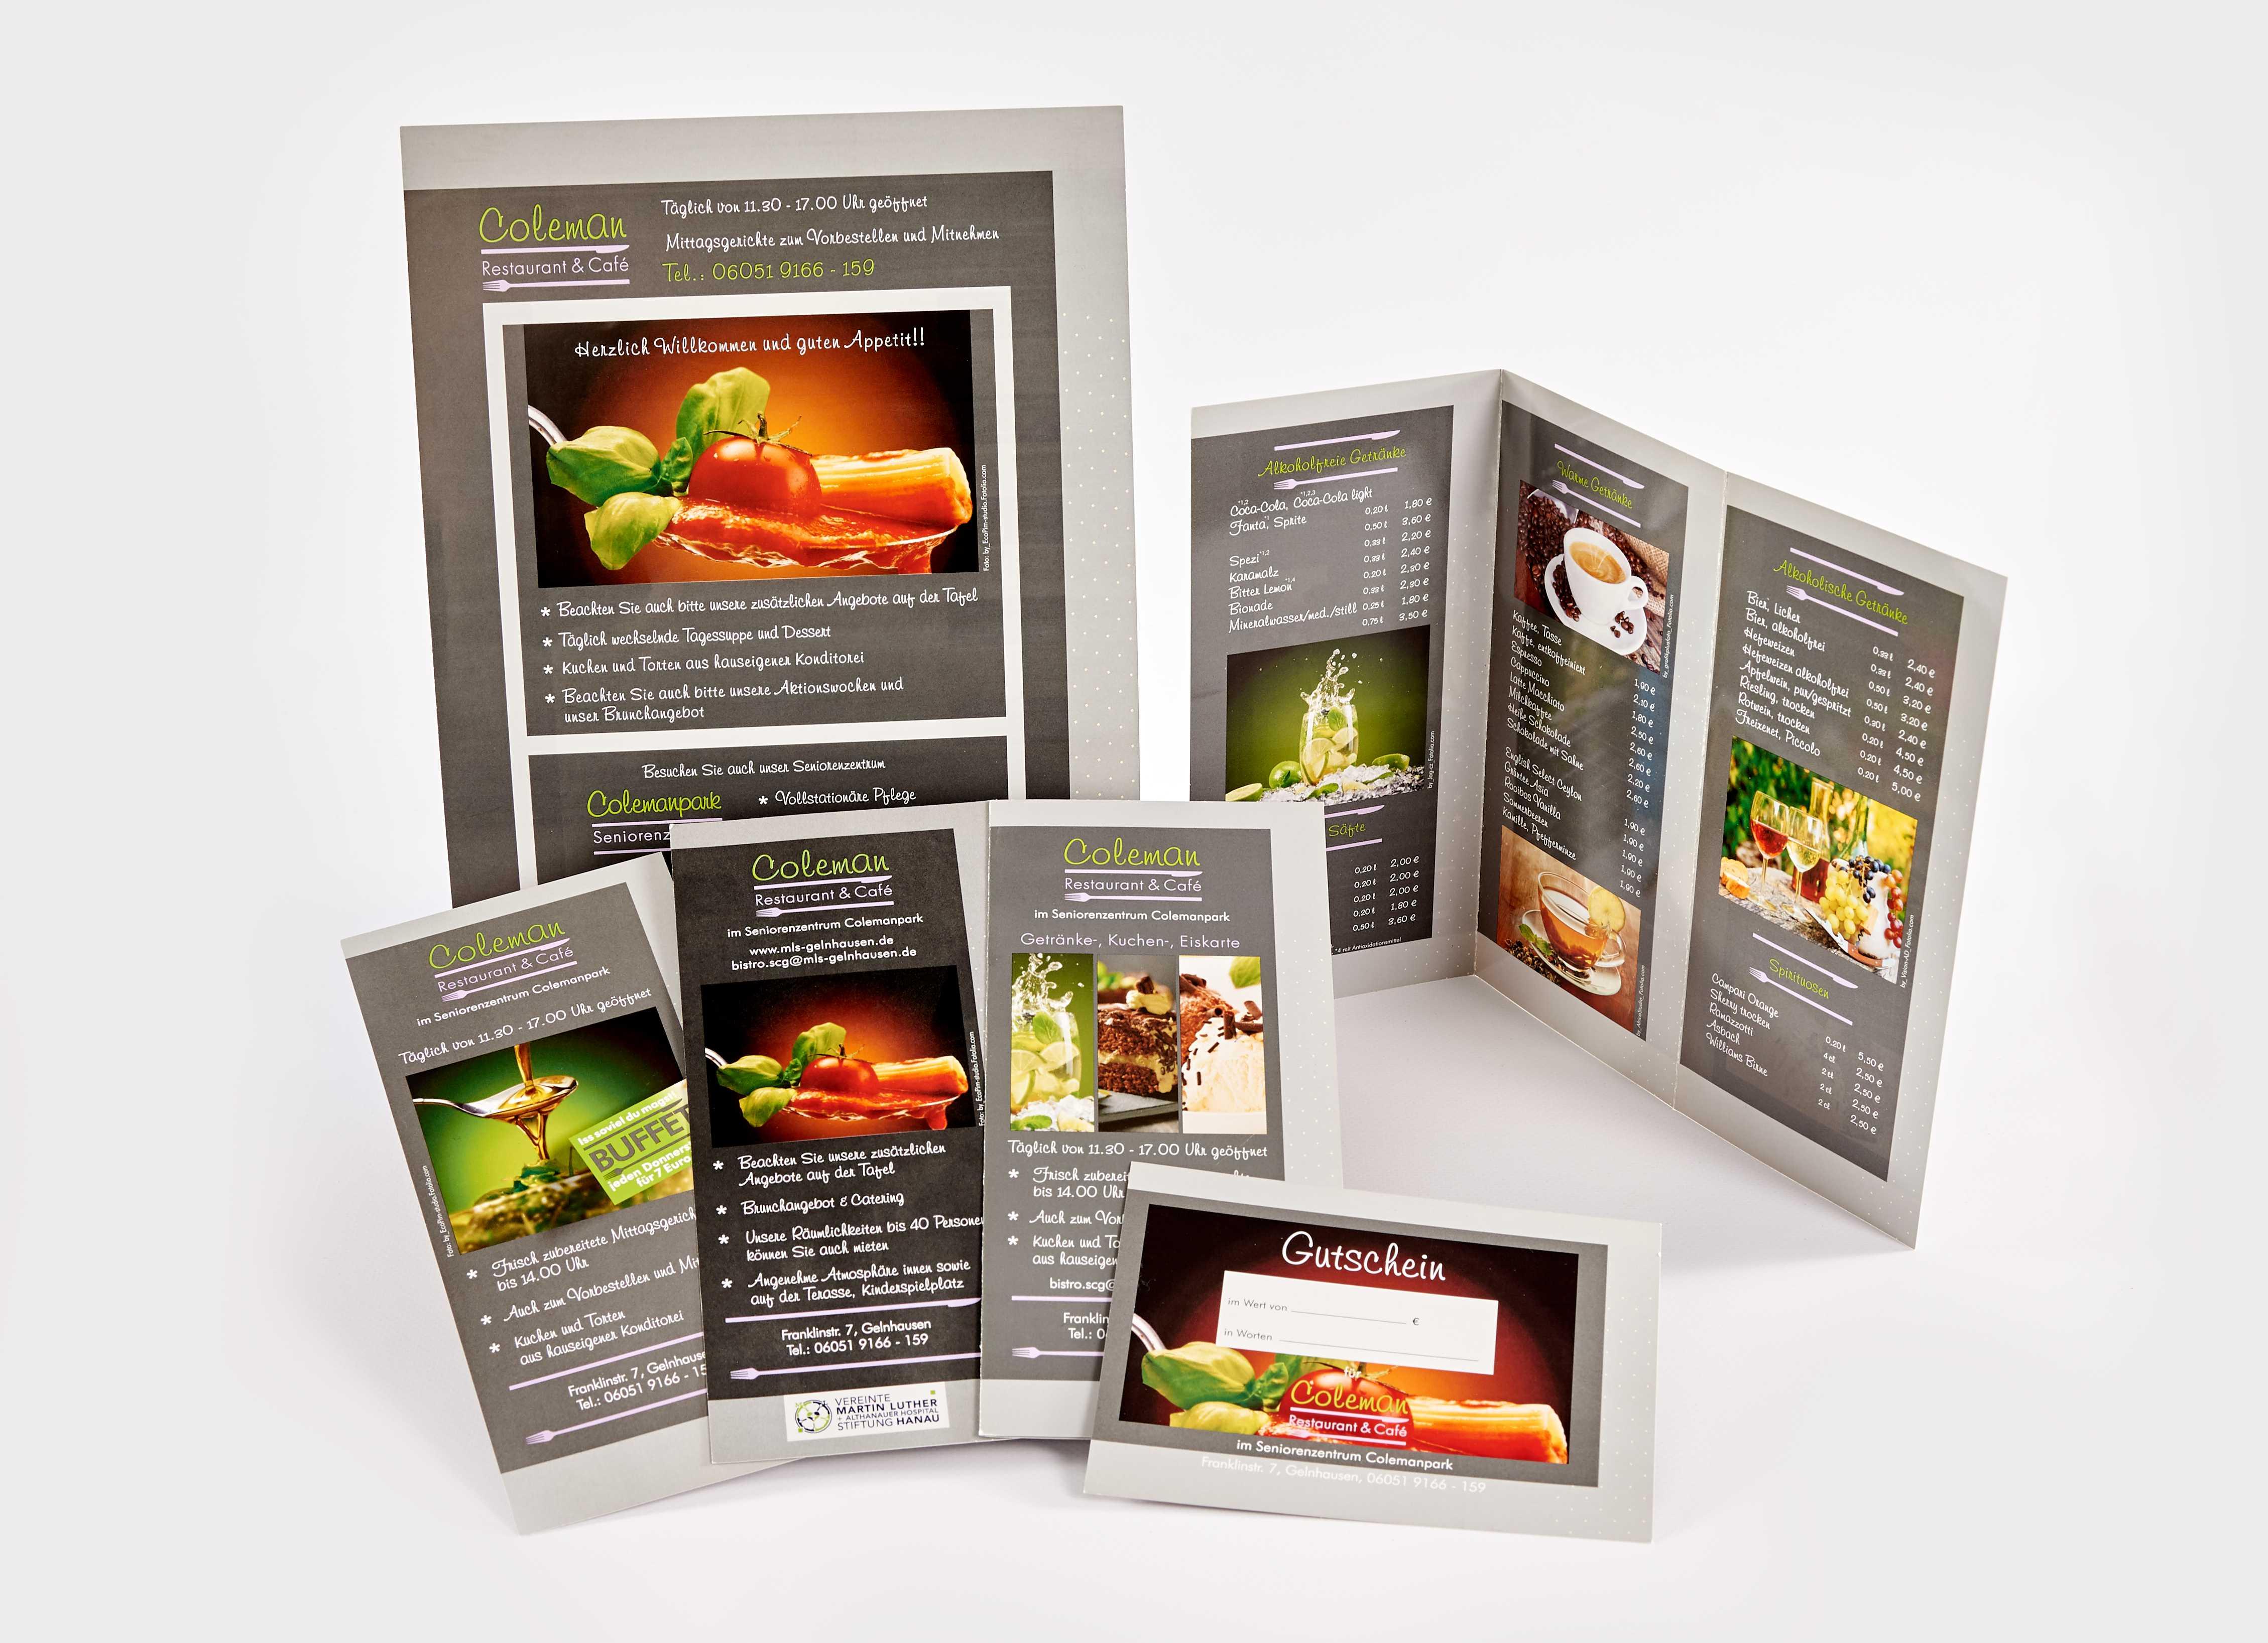 ellen-design - Grafikdesign: Corporate Design - Flyer & Speisekarte ...